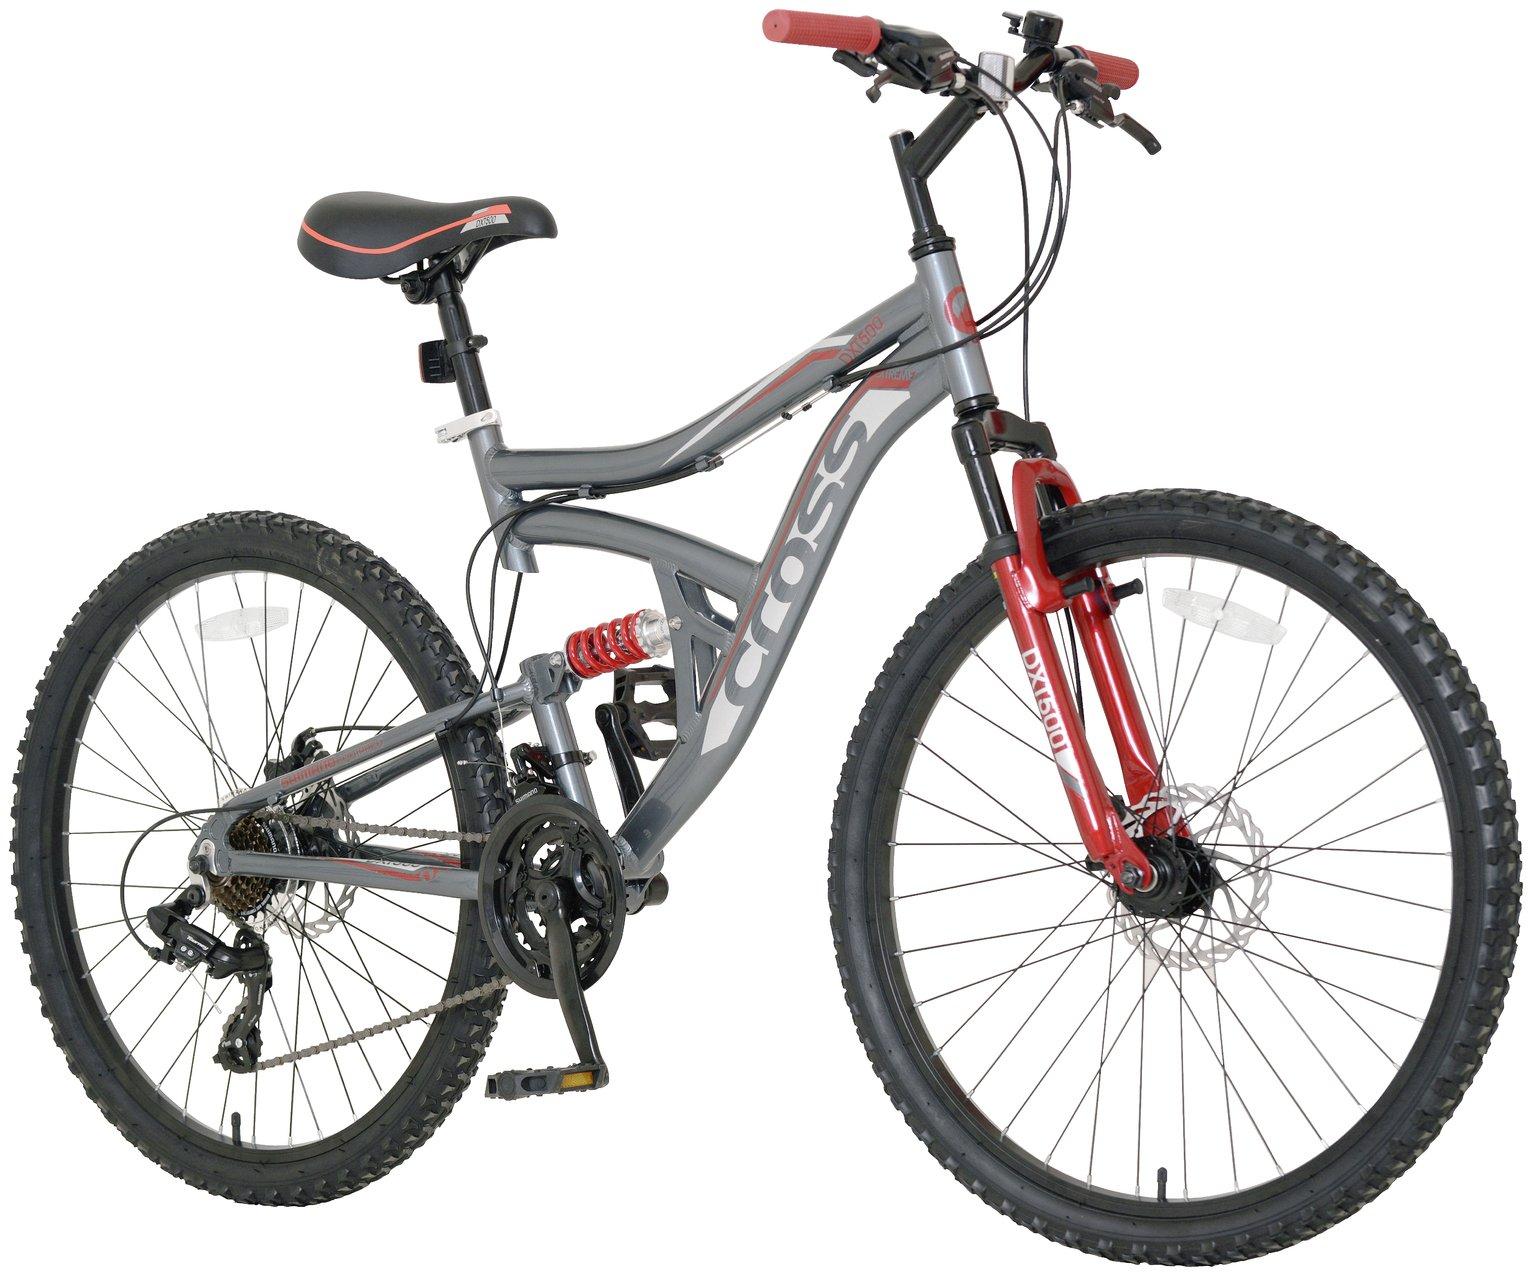 Image of Cross DXT500 Dual Suspension Mountain Bike